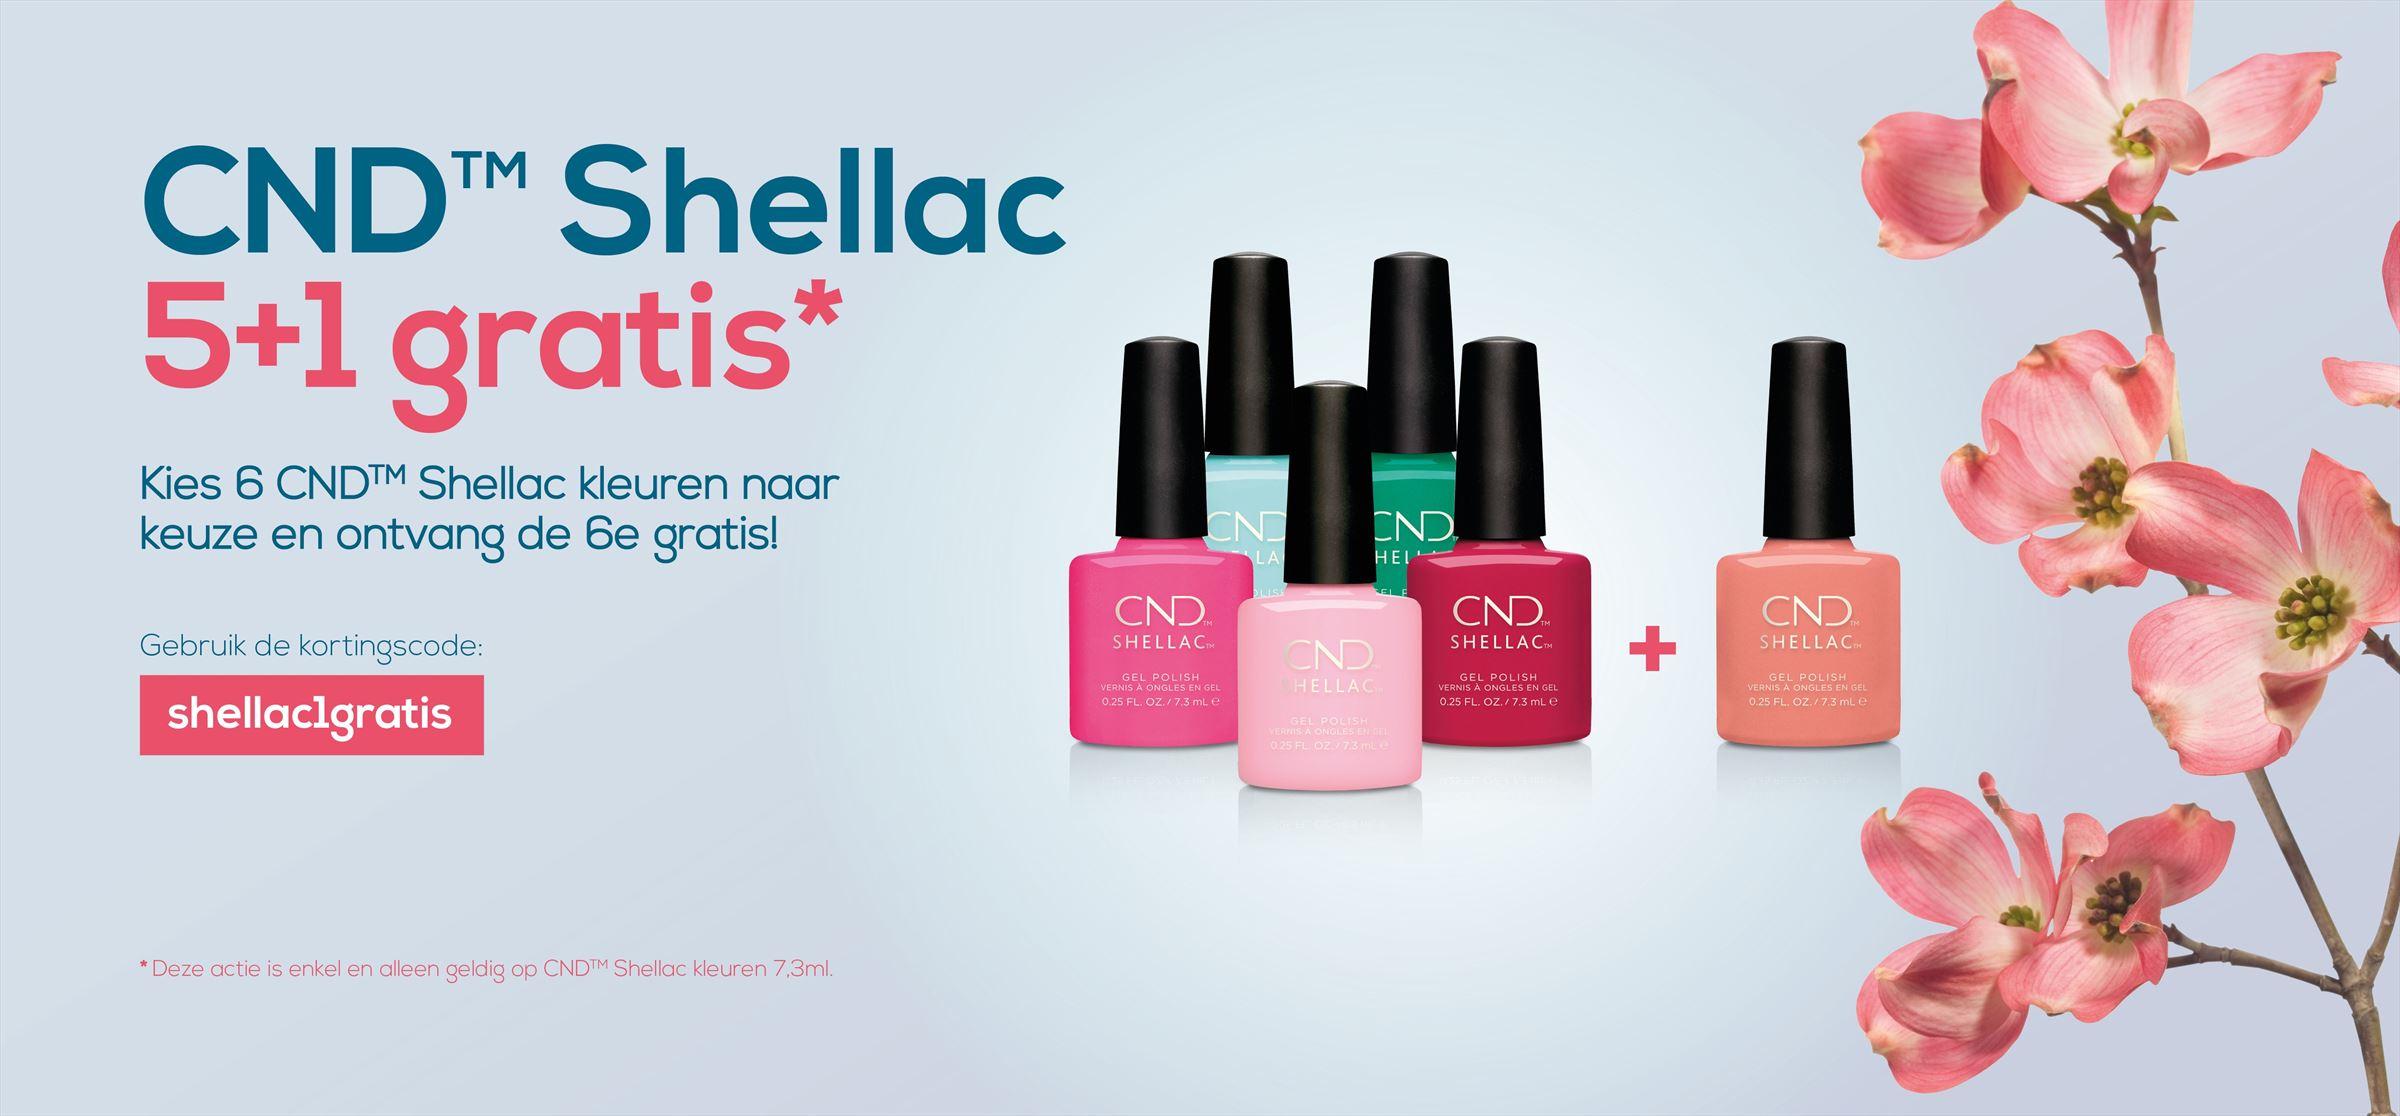 CND Shellac 5+1 Gratis